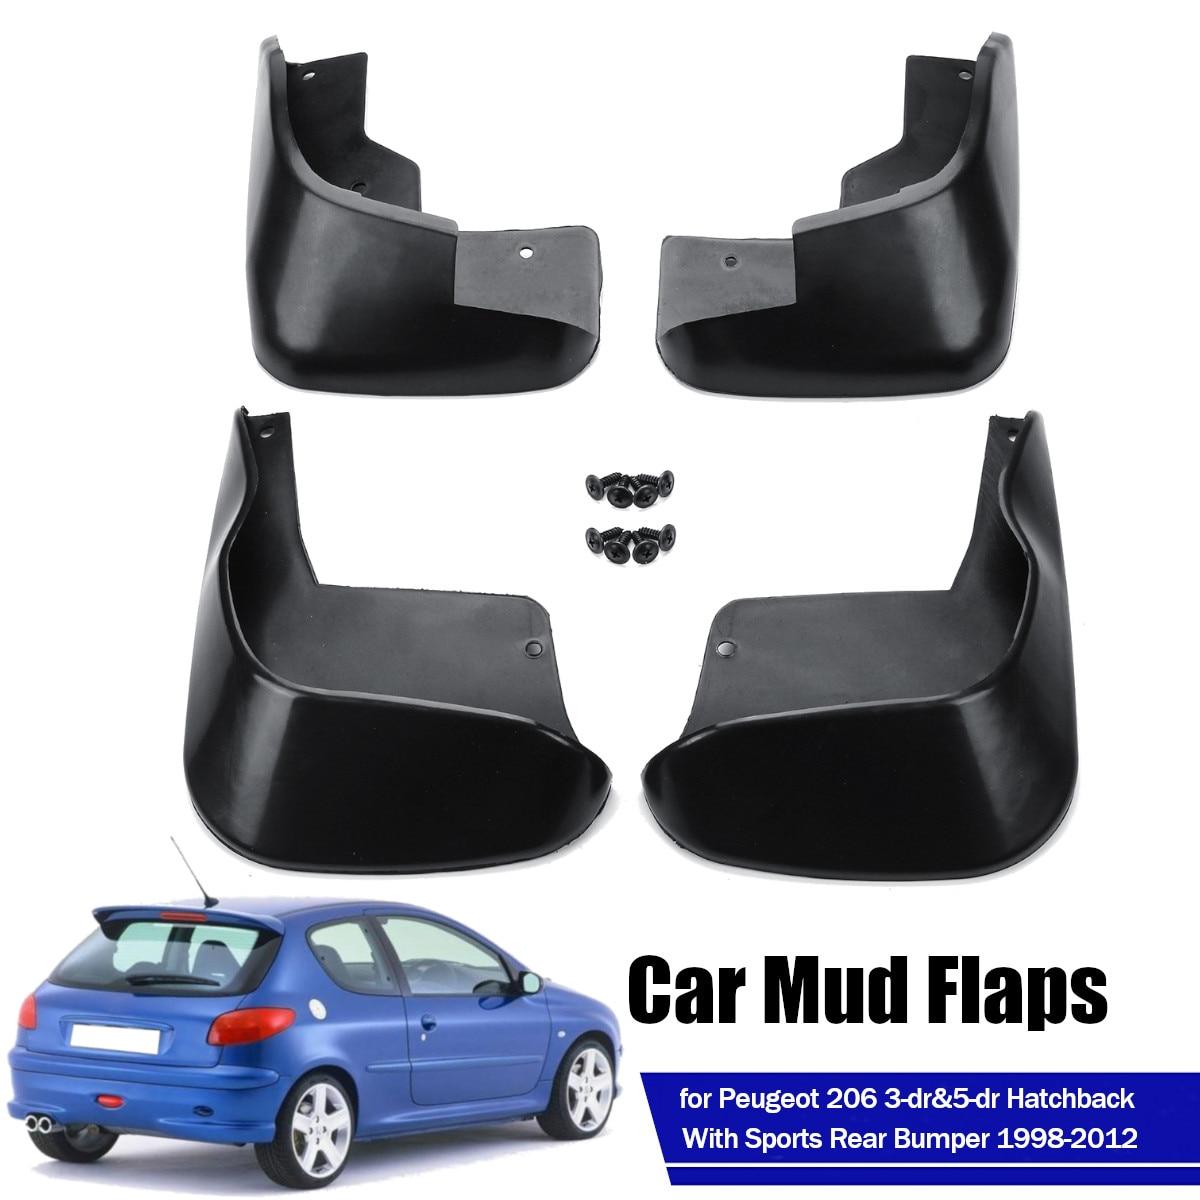 4Pcs รถ Fender Mud Flaps ด้านหน้าด้านหลัง Mudflaps Mud Splash Guards Mudguards สำหรับ Peugeot 206 1998-2012